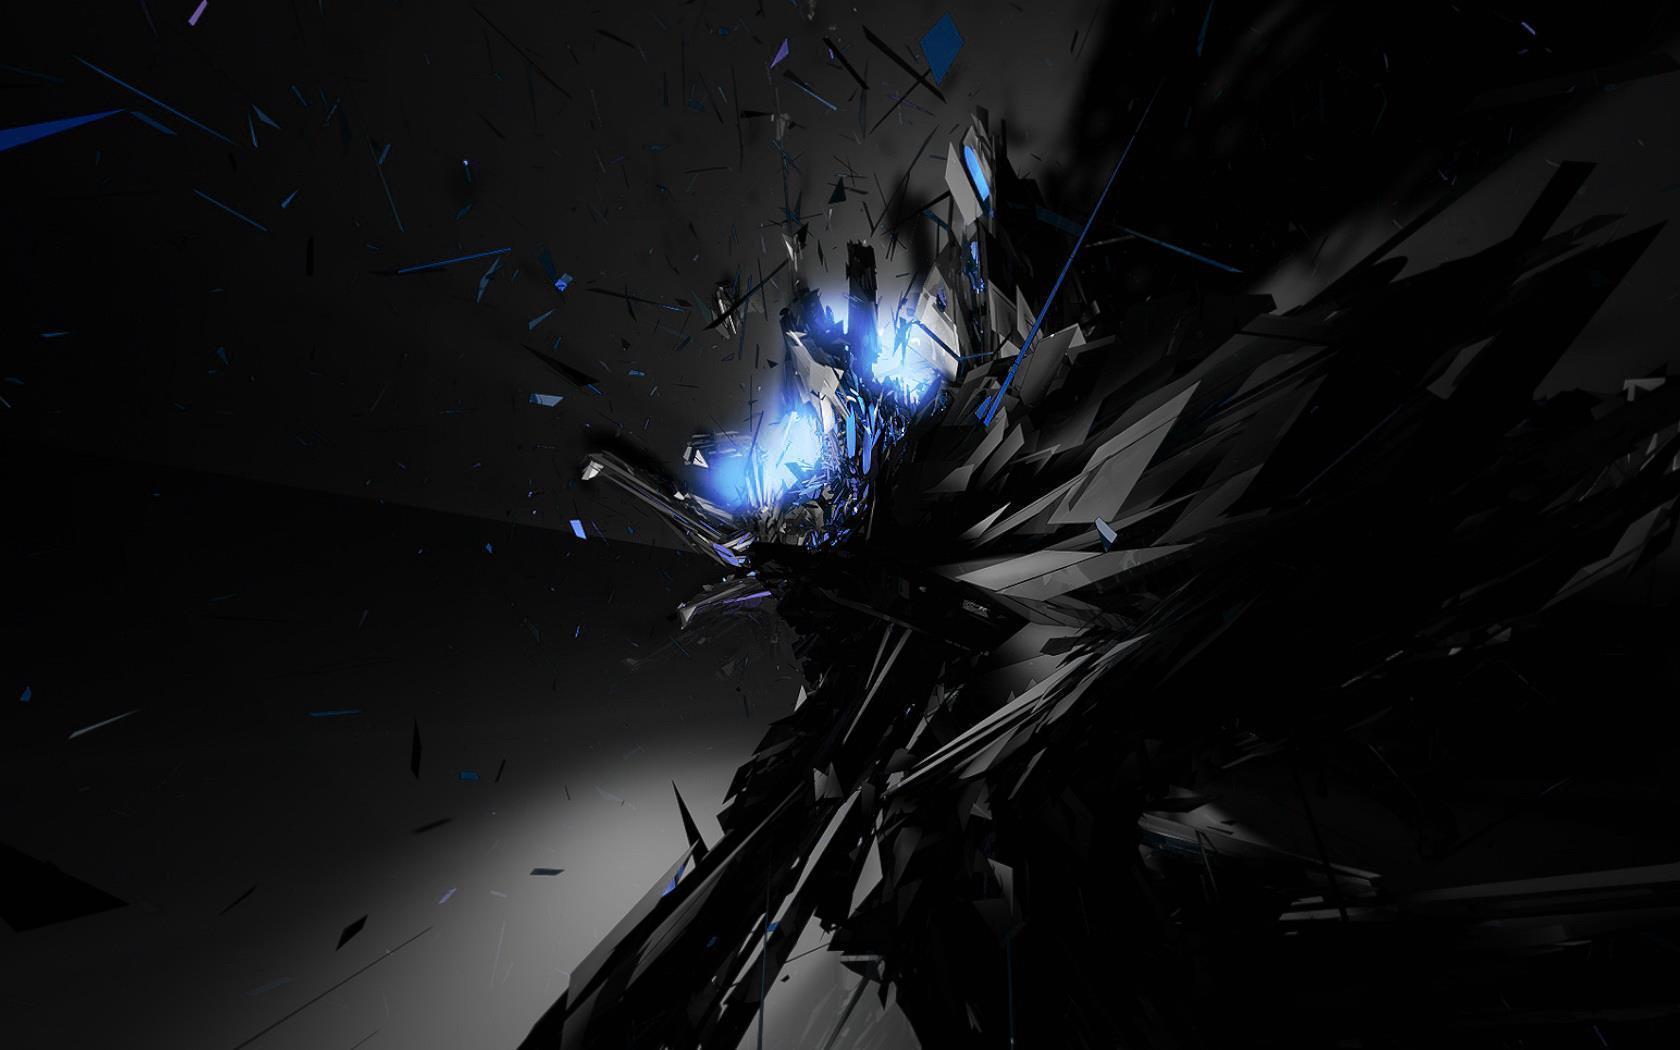 creatifs-fonds-d-ecran-inventifs-et-lumineux-3